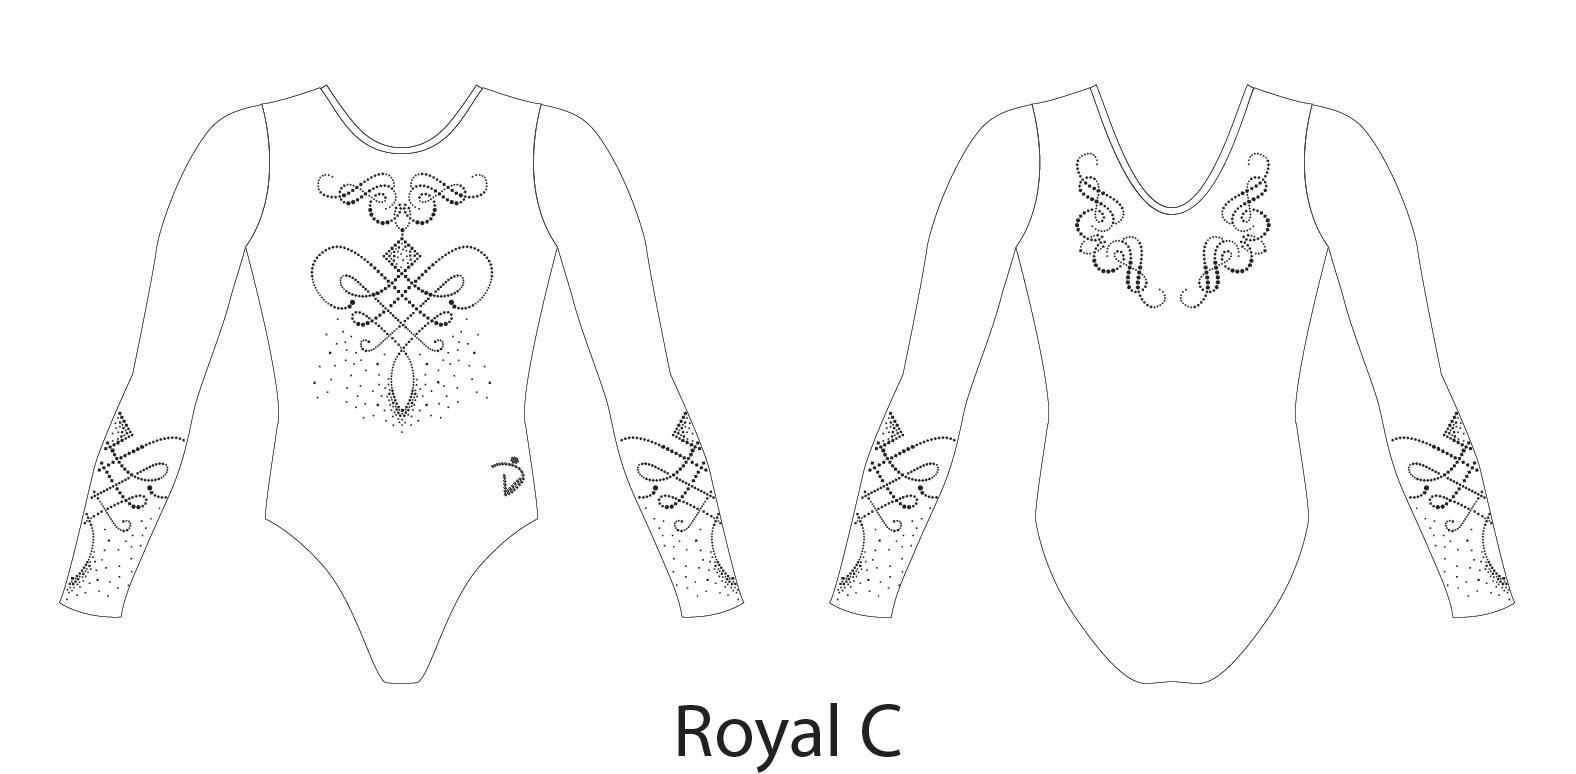 Royal C